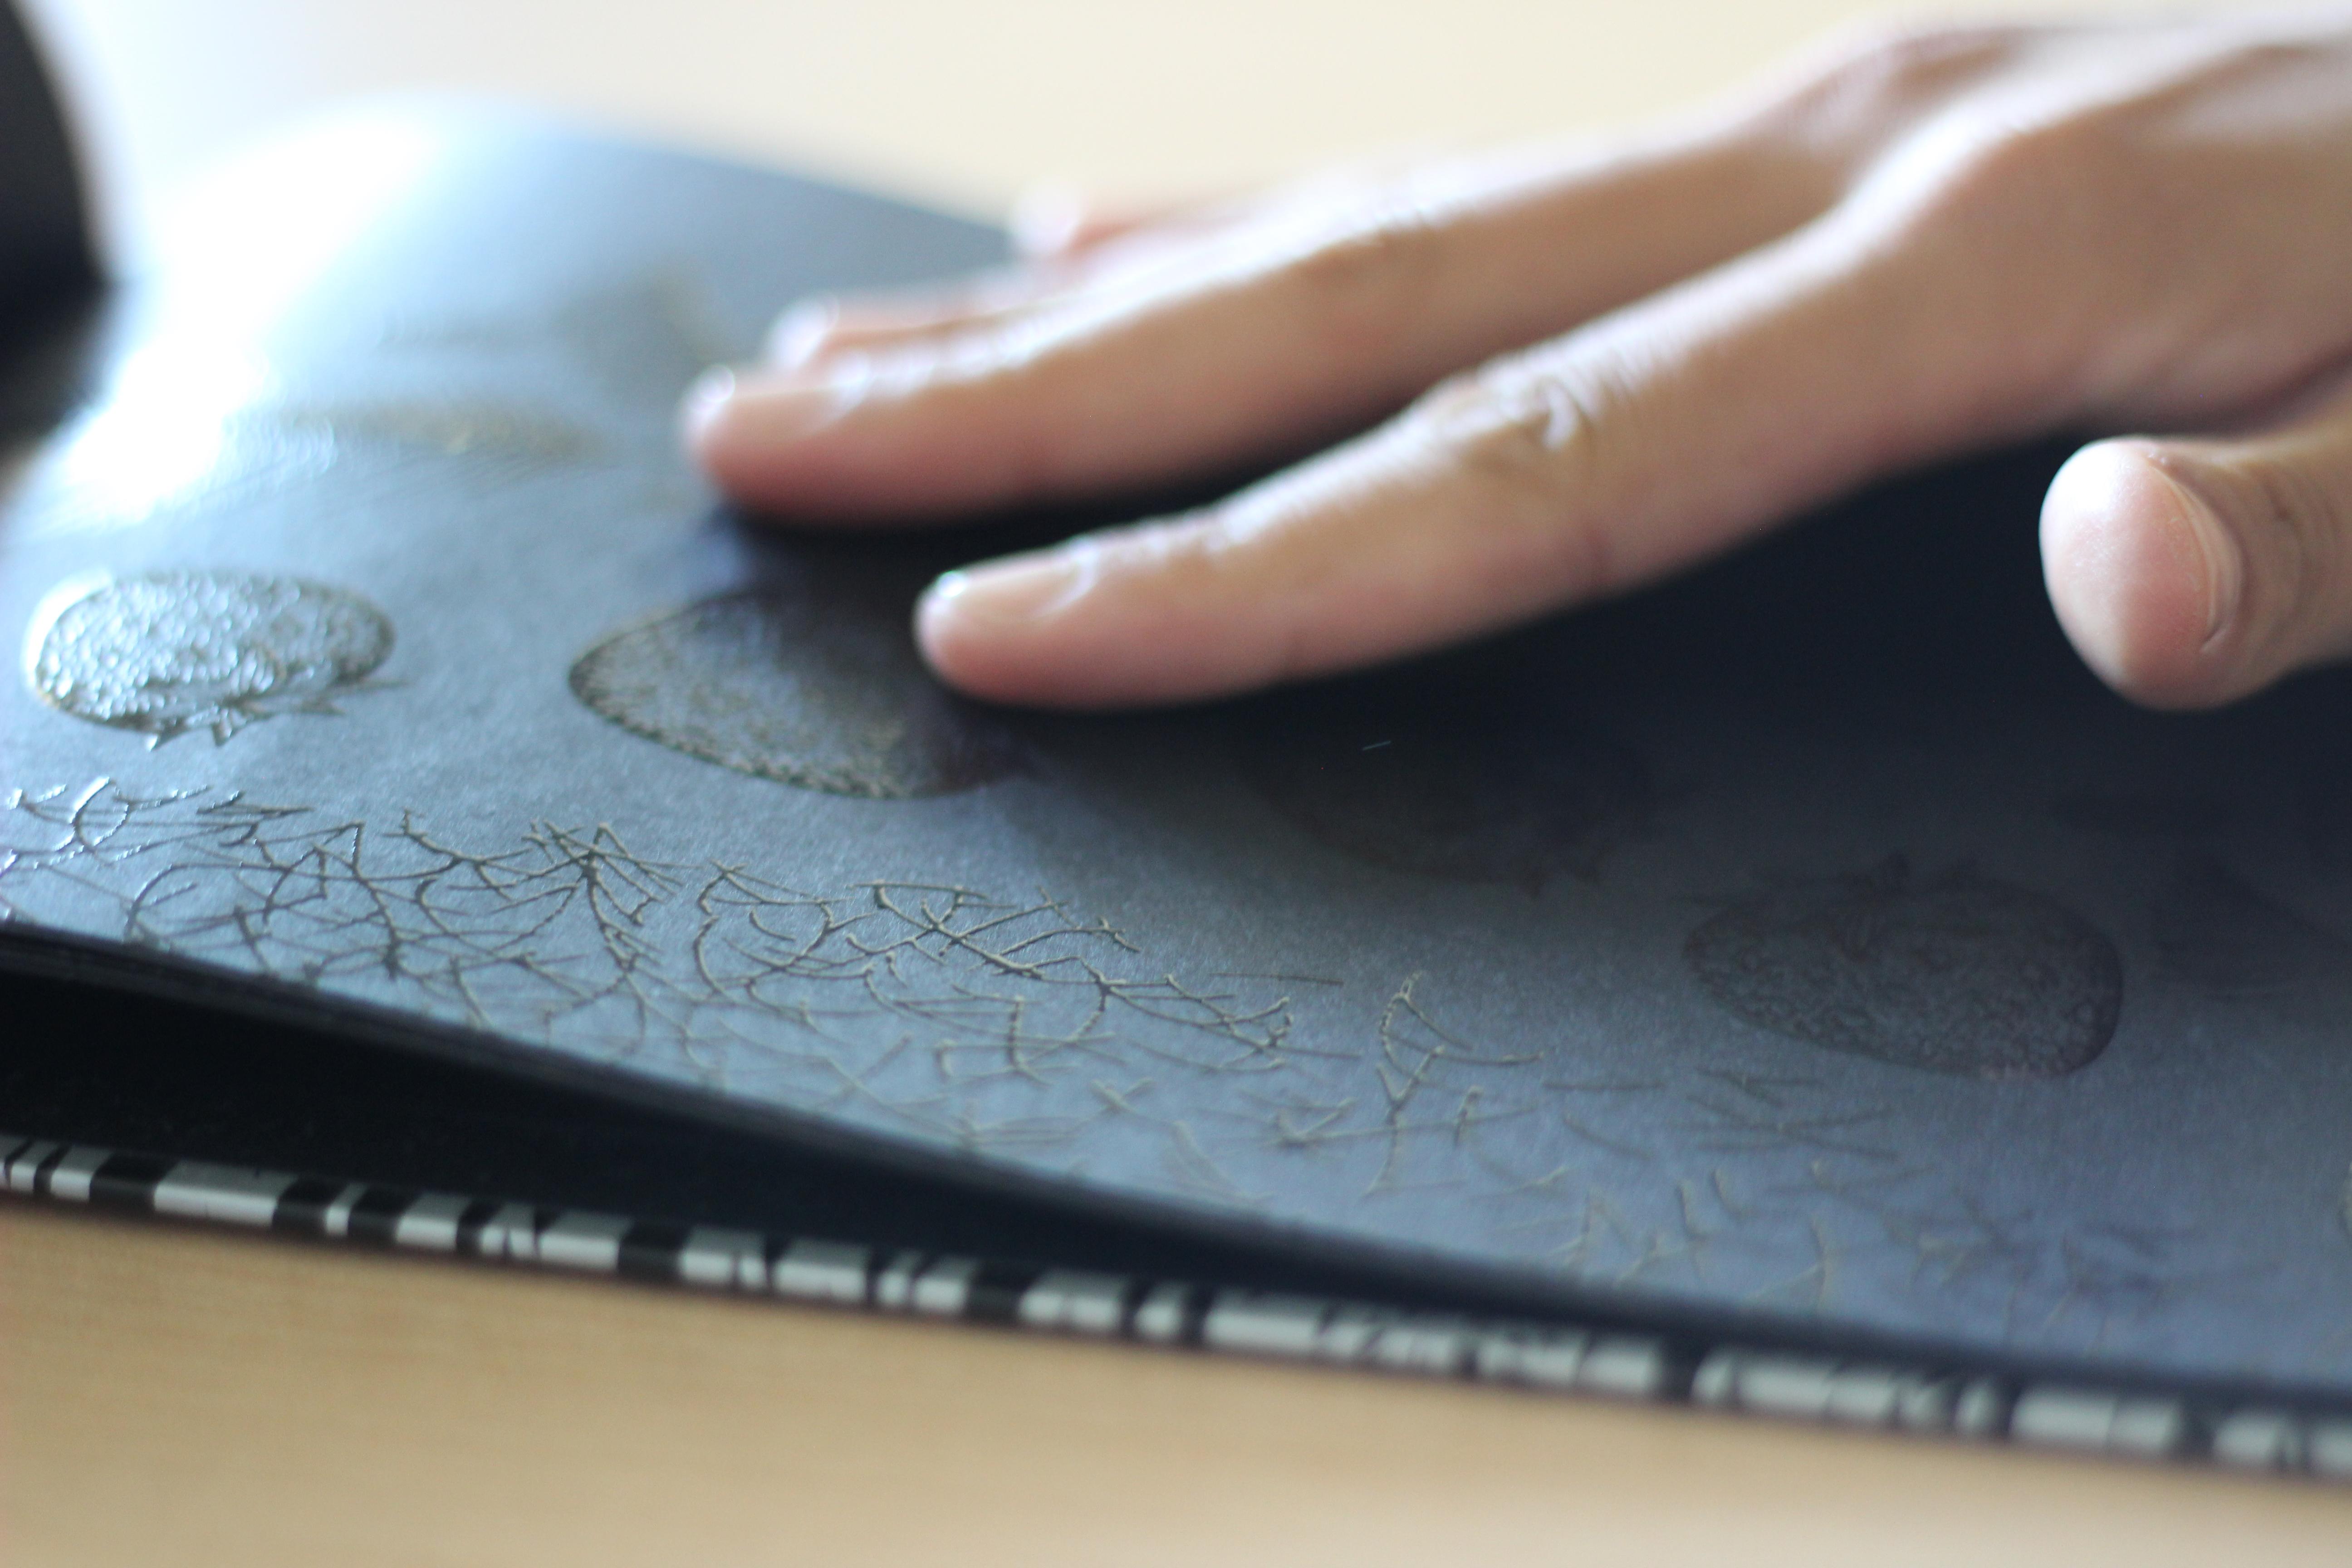 El Libro Negro de los colores di M. Cottin e R. Farìa